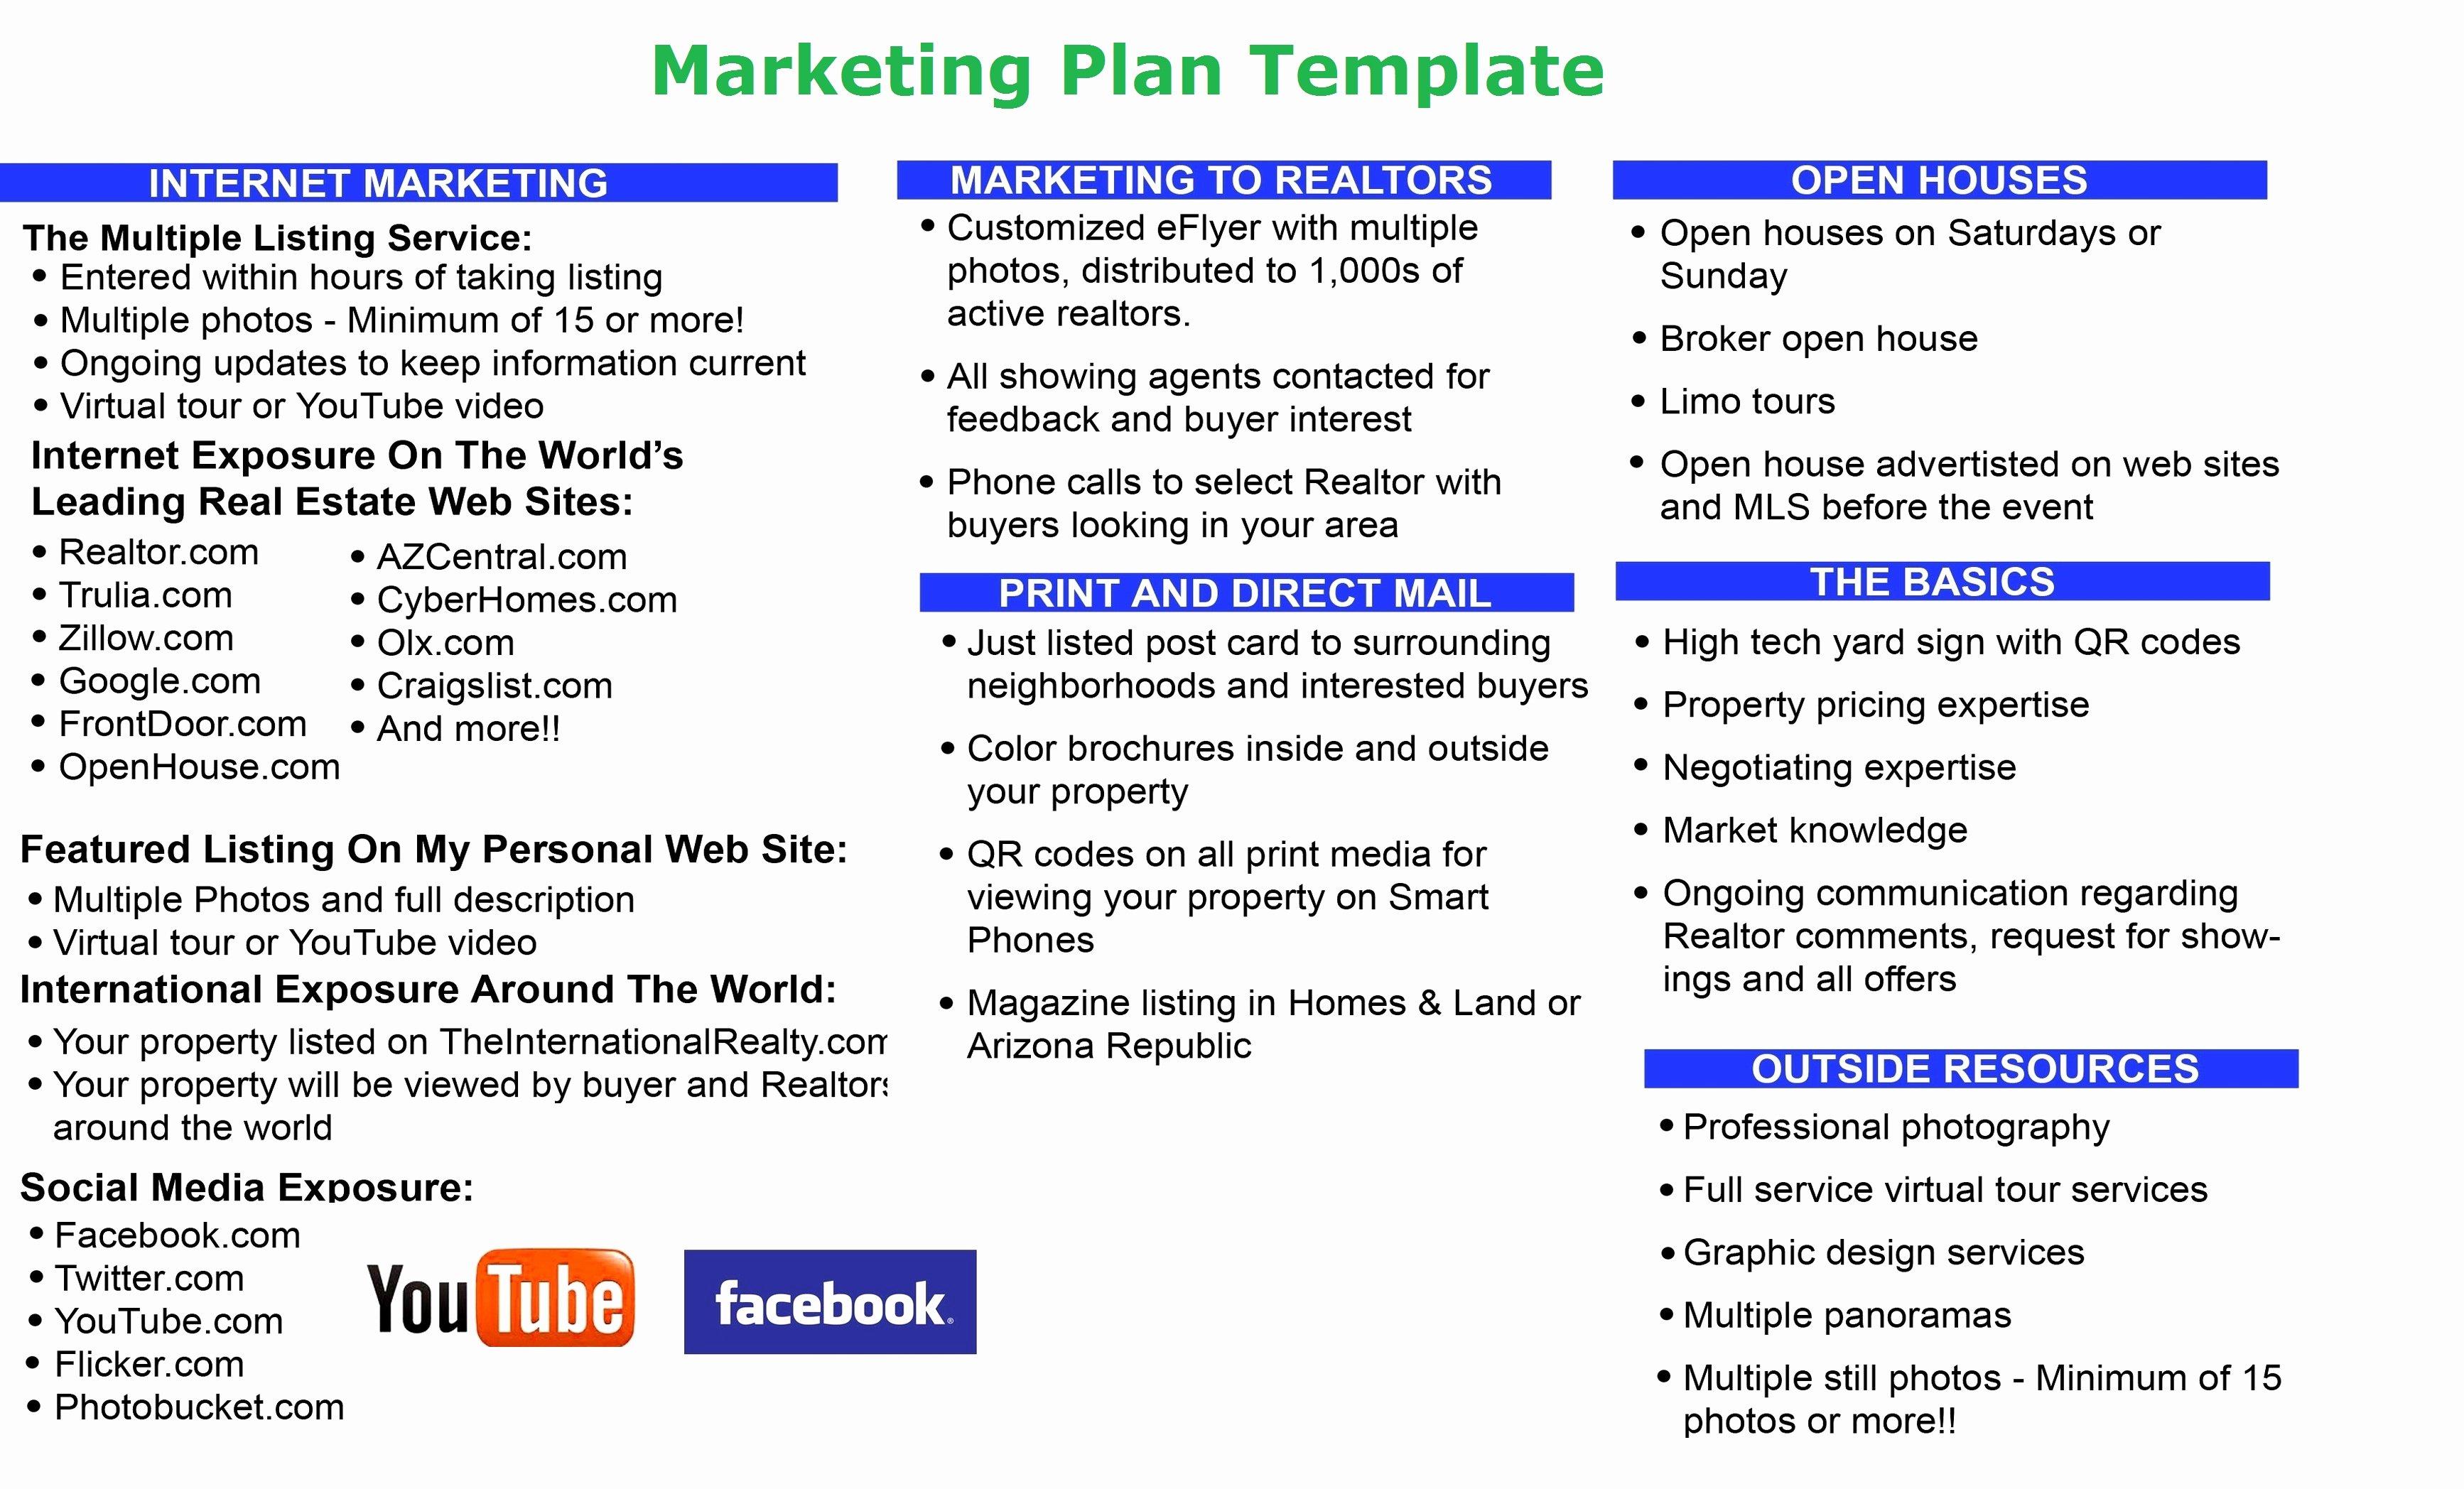 Ecommerce Marketing Plan Template Best Of Marketing Plan